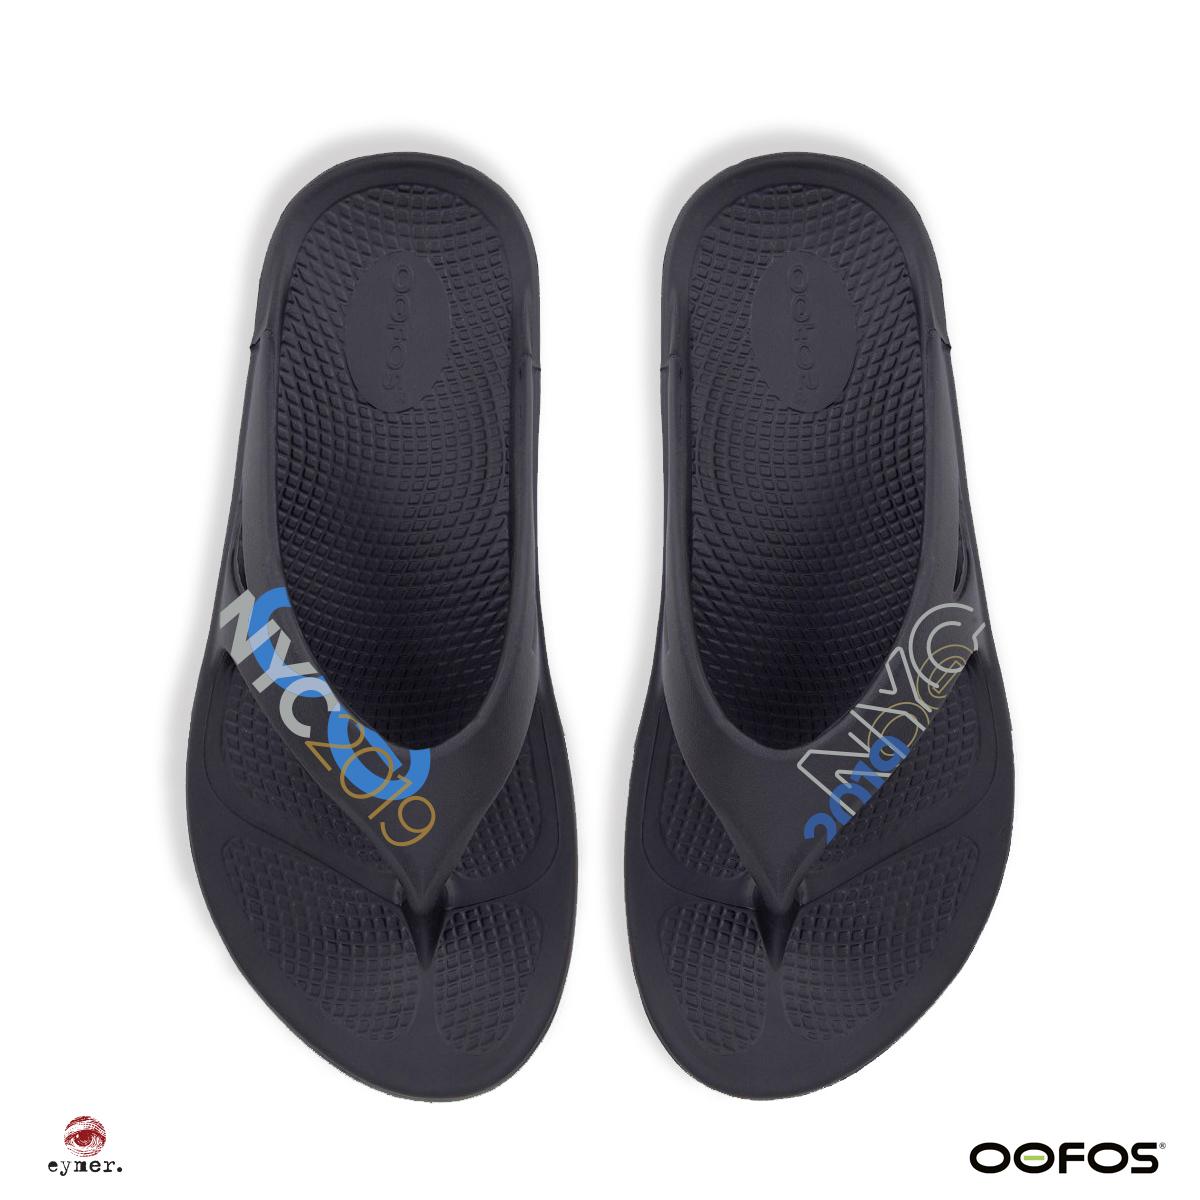 OOriginal sandal   New York City